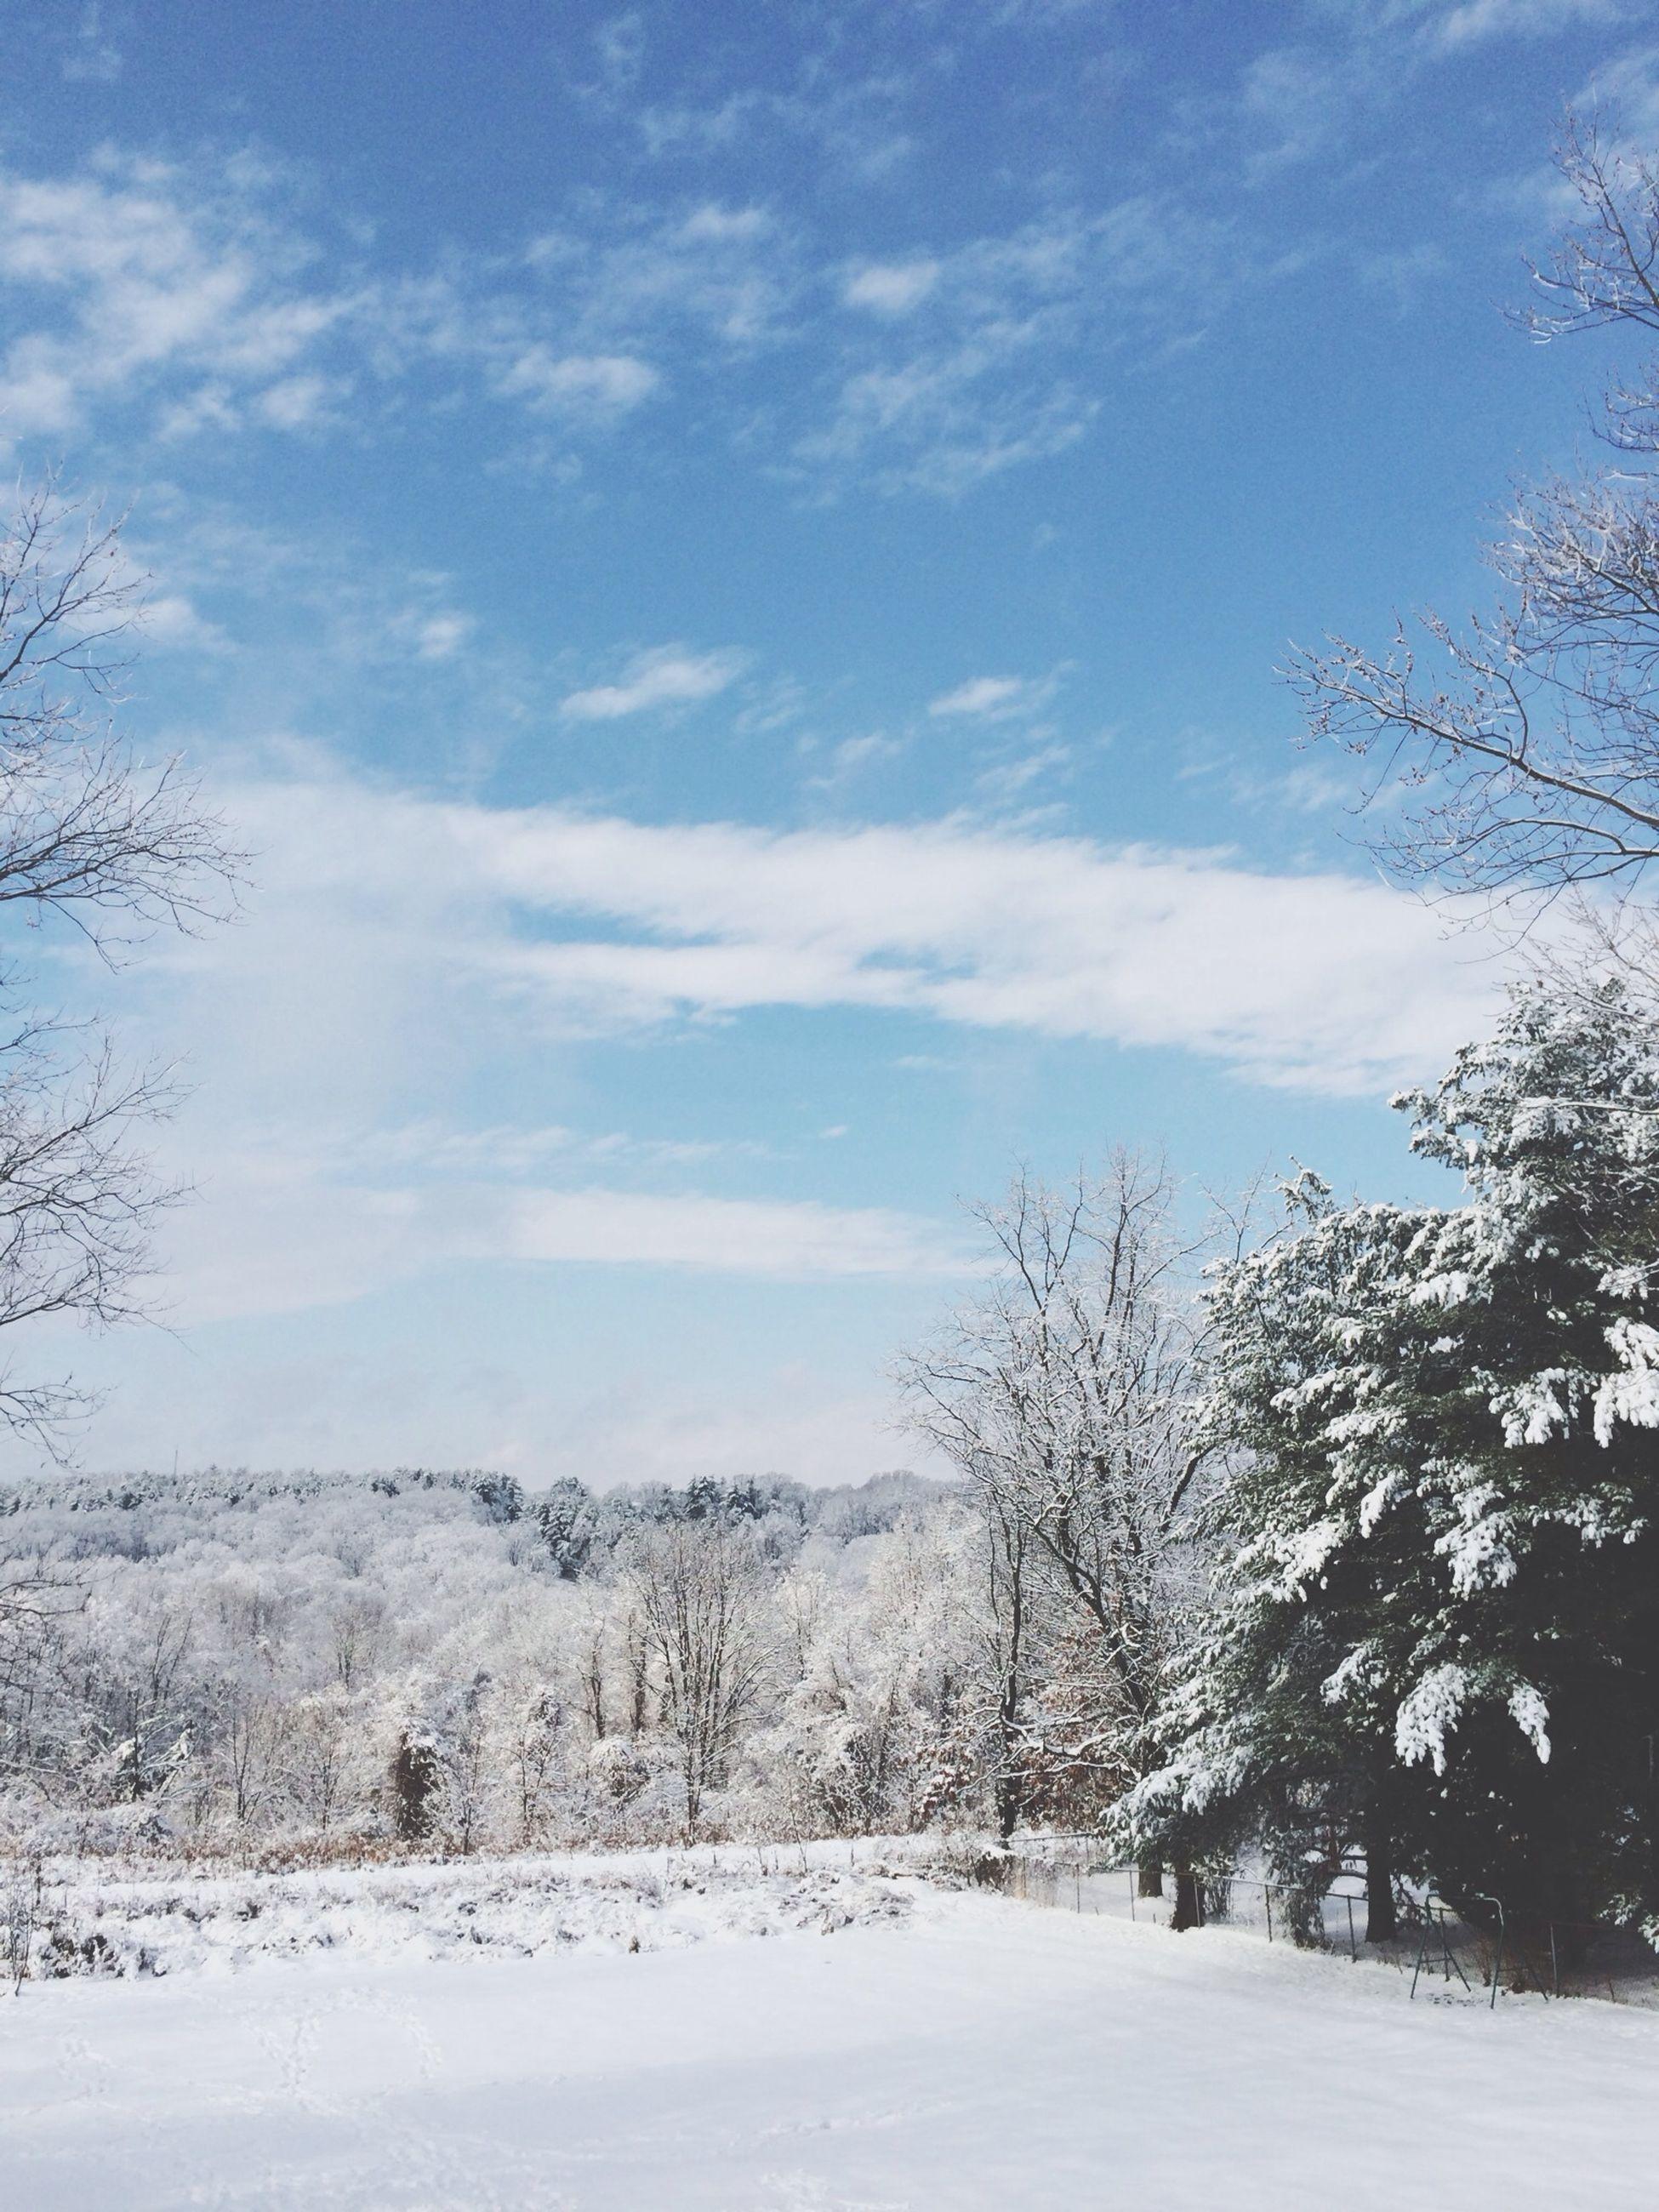 snow, winter, cold temperature, season, weather, tree, tranquility, tranquil scene, landscape, sky, covering, beauty in nature, scenics, nature, white color, field, frozen, bare tree, covered, non-urban scene